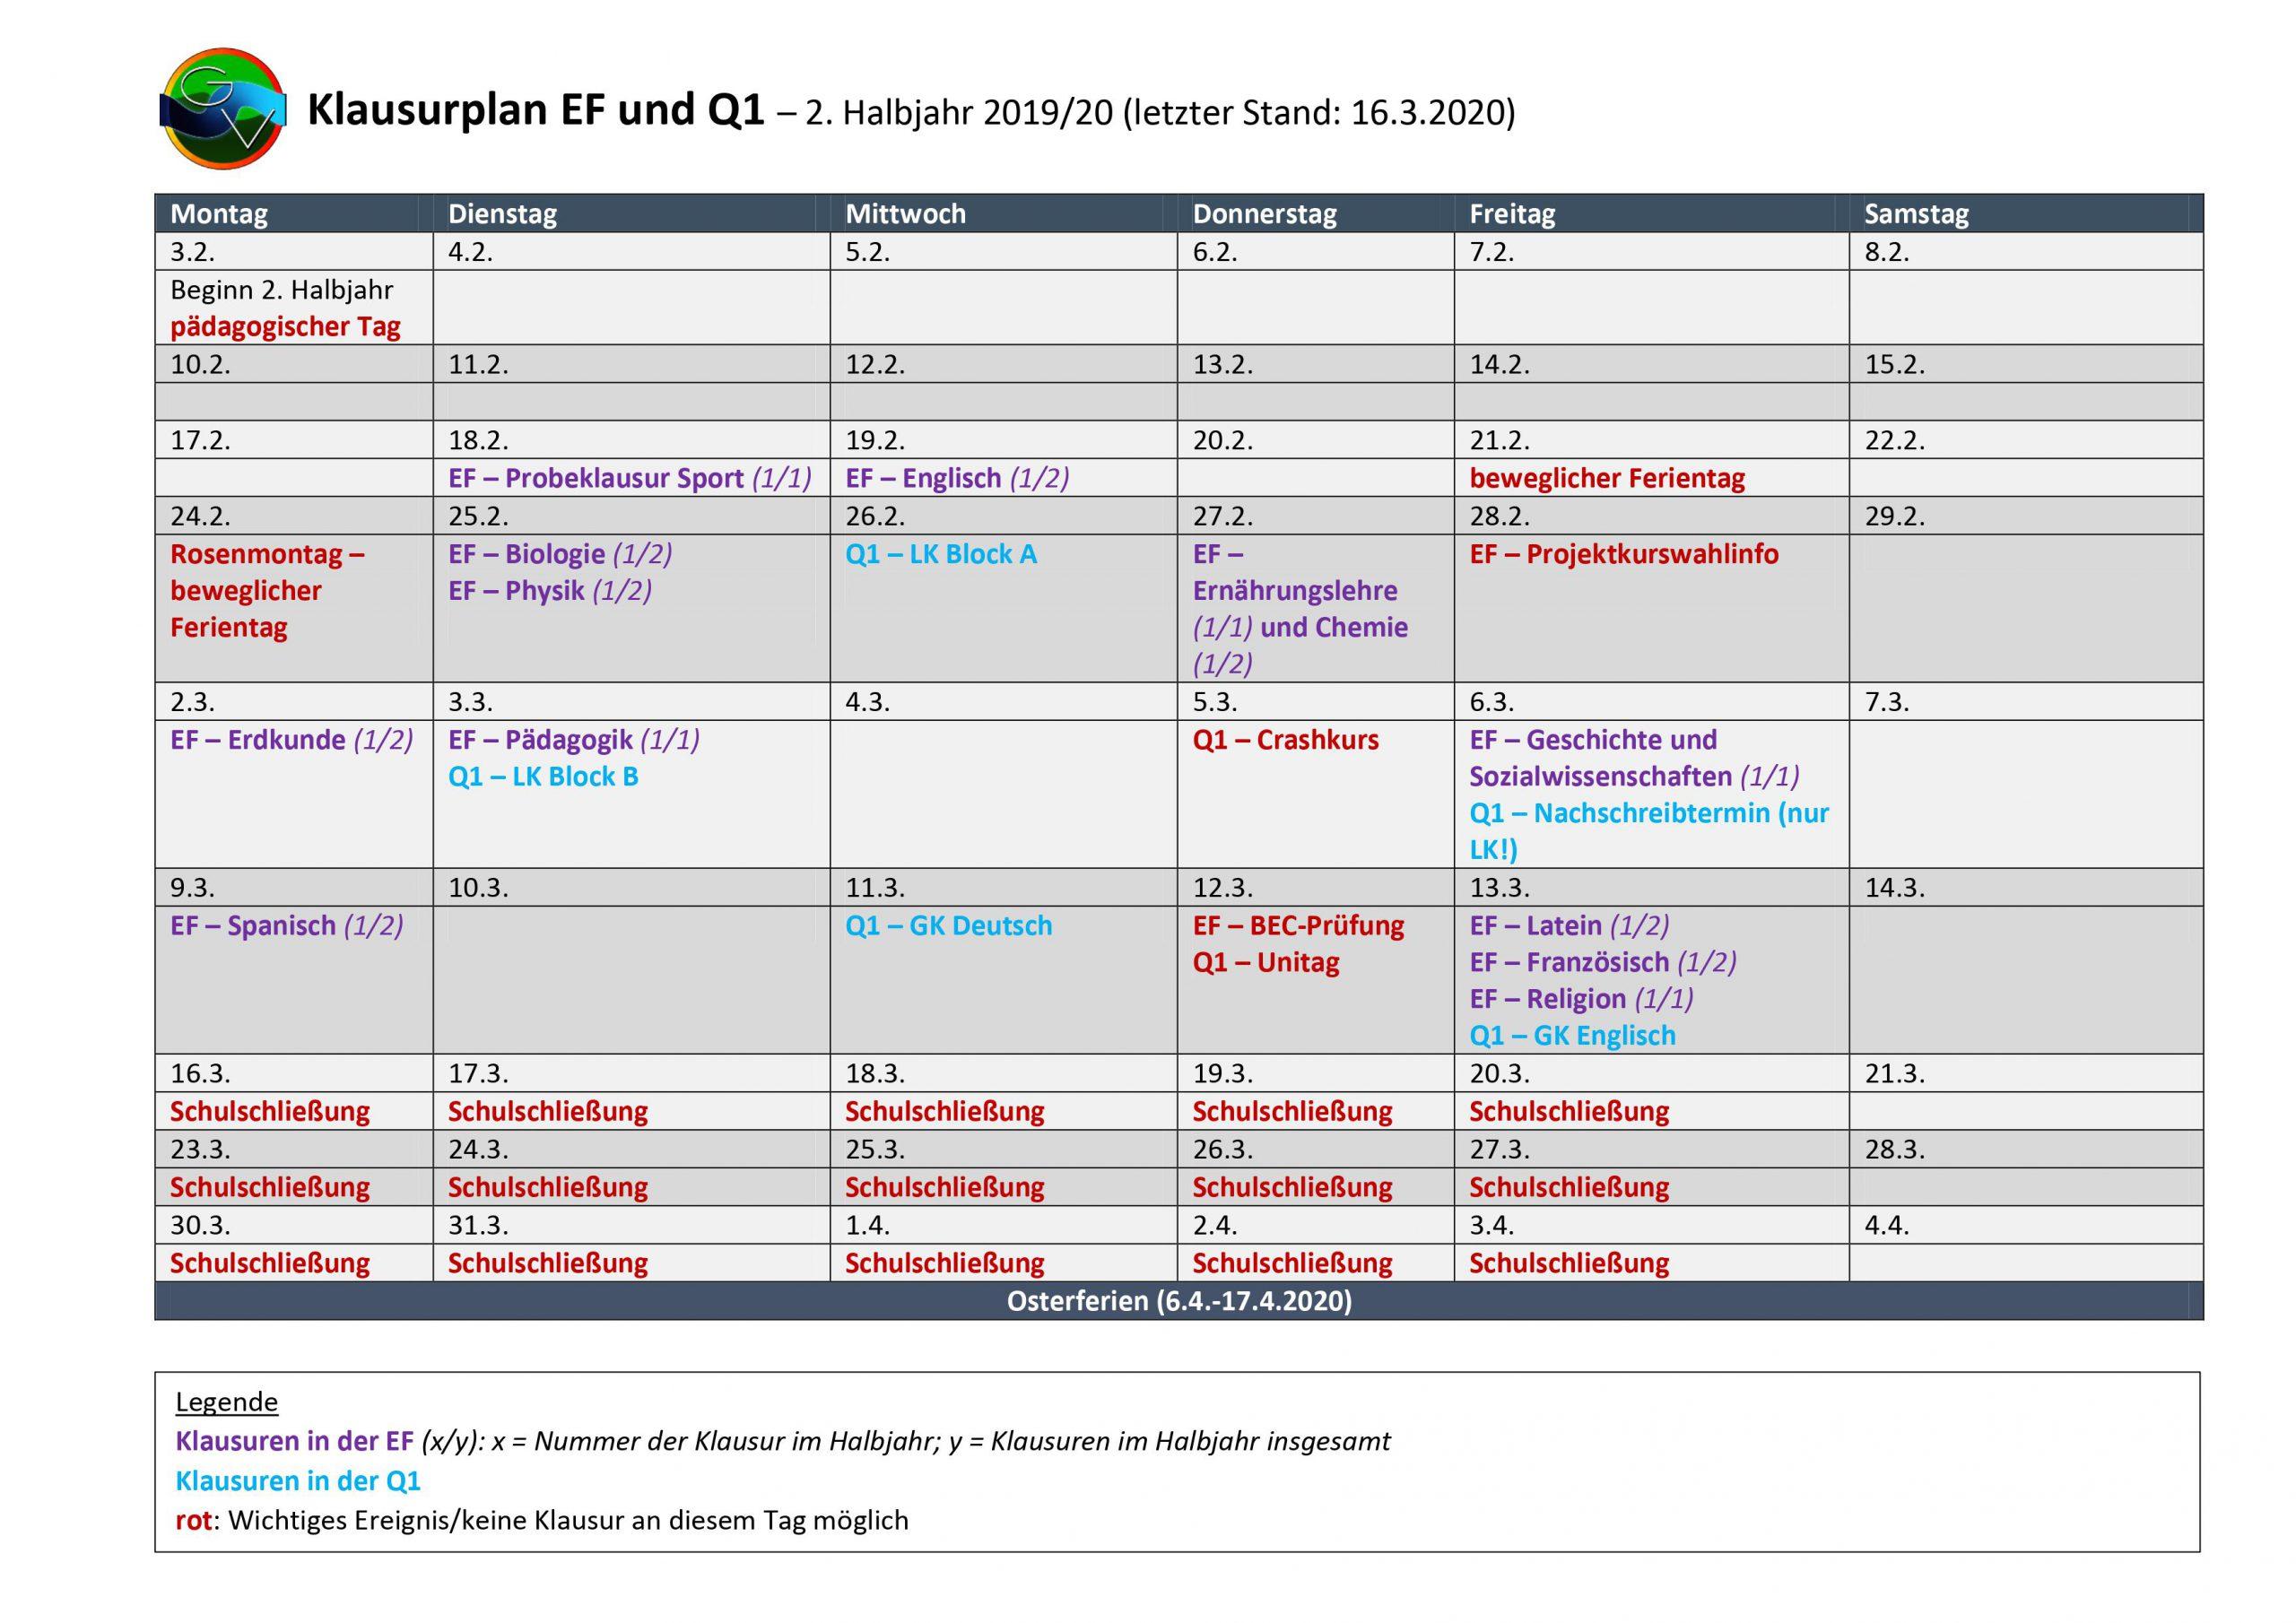 2020-03-16_Klausurplan-EF-Q1-2HJ_1